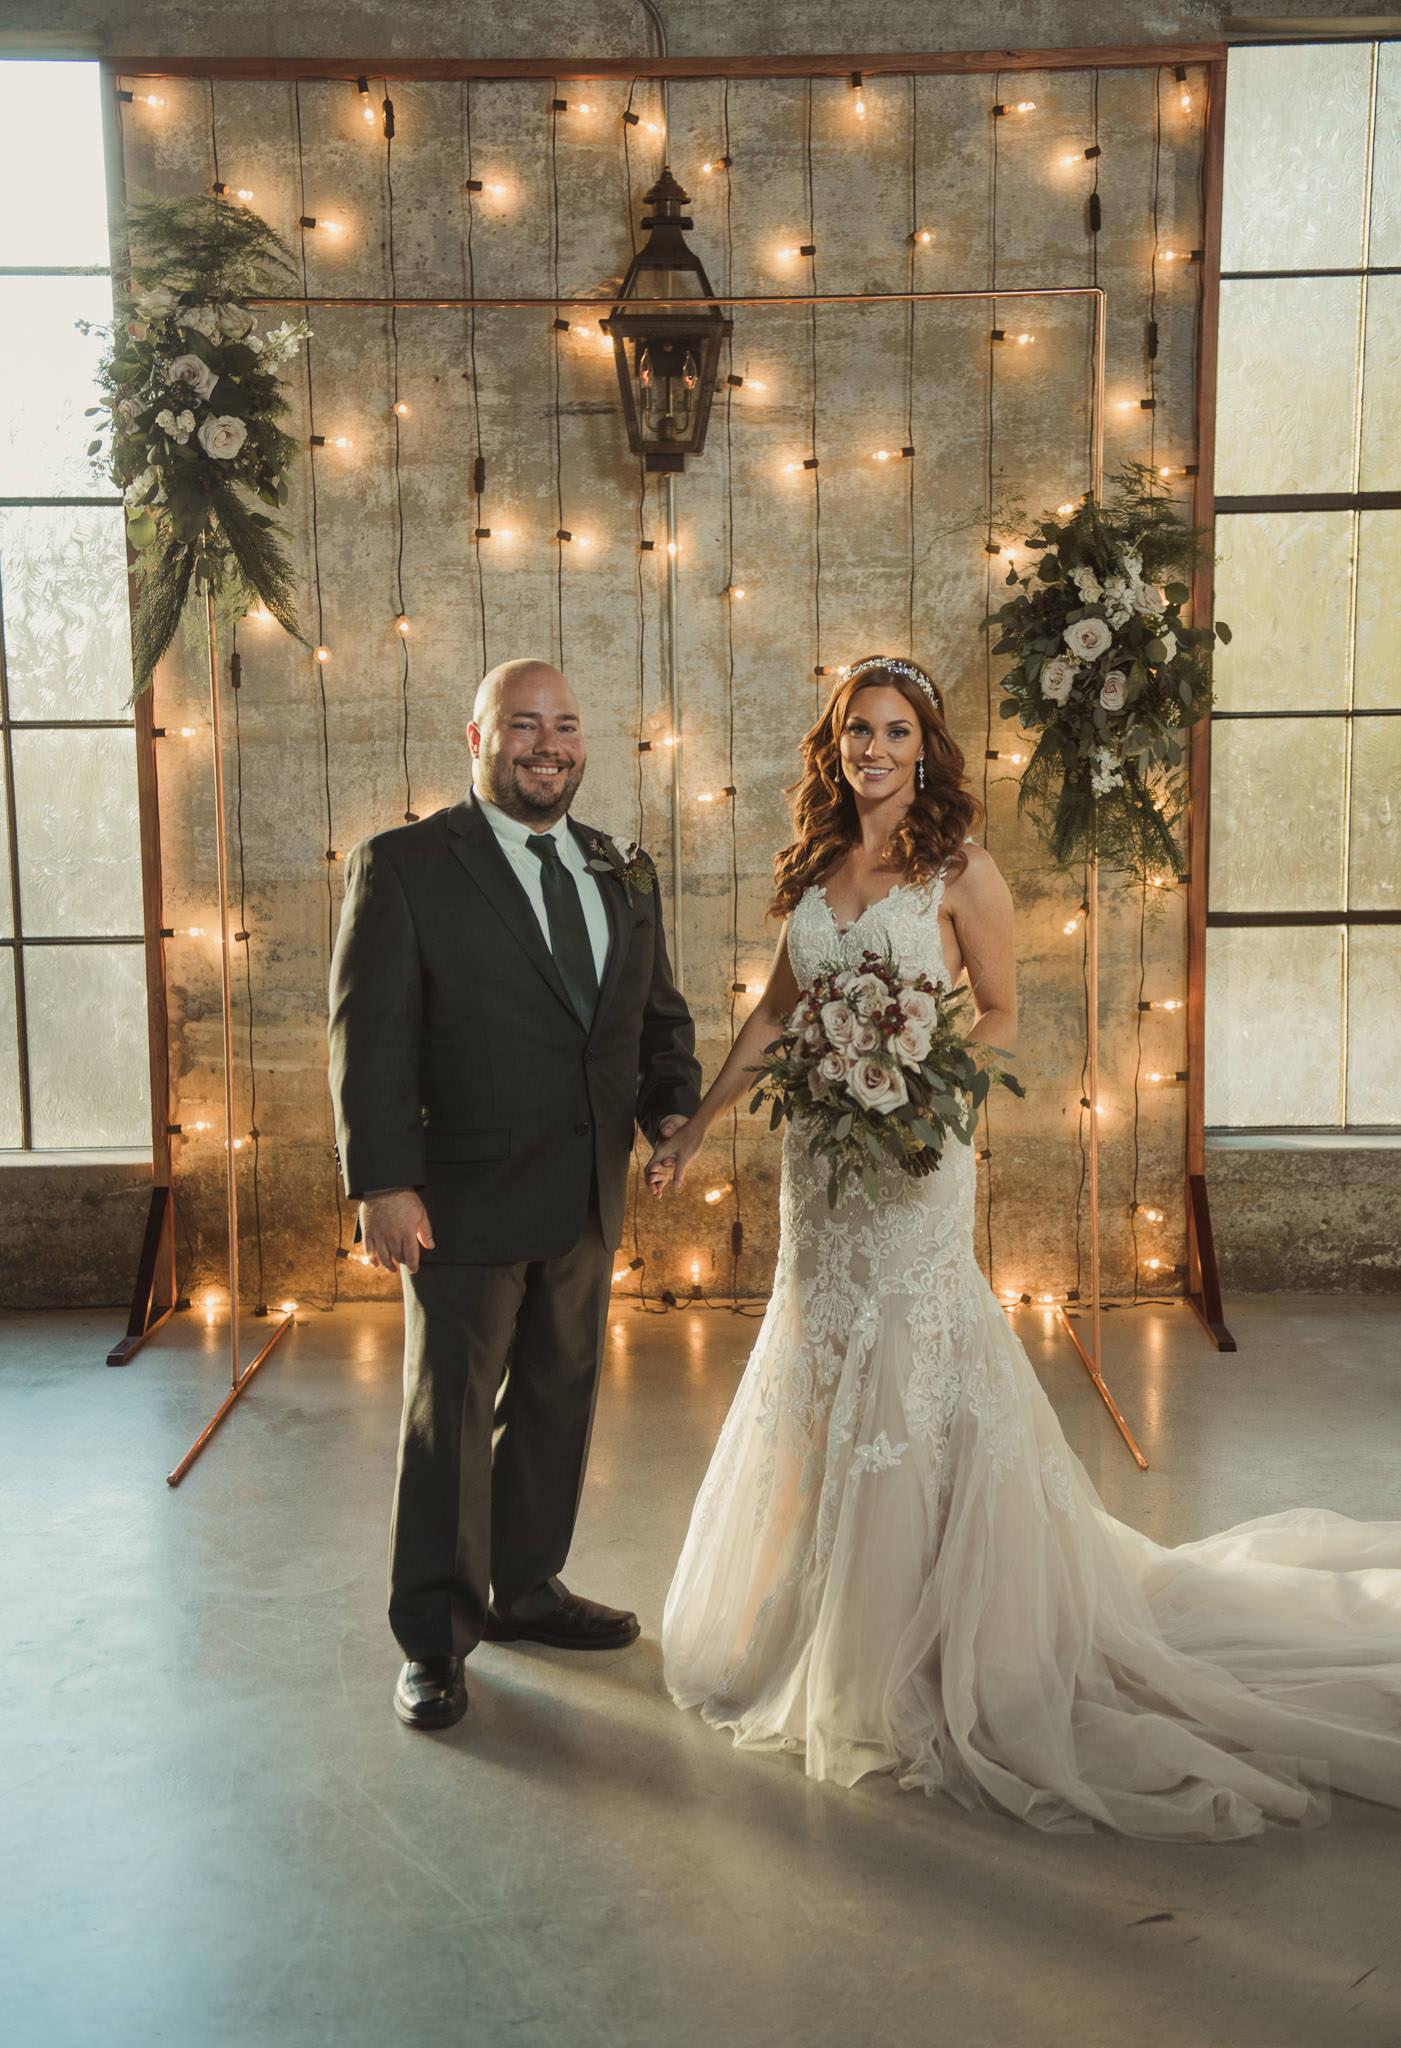 Cynthia-Curtis-Olde-Dobbine-Station-Houston-Wedding-Photographer-sm-58.jpg